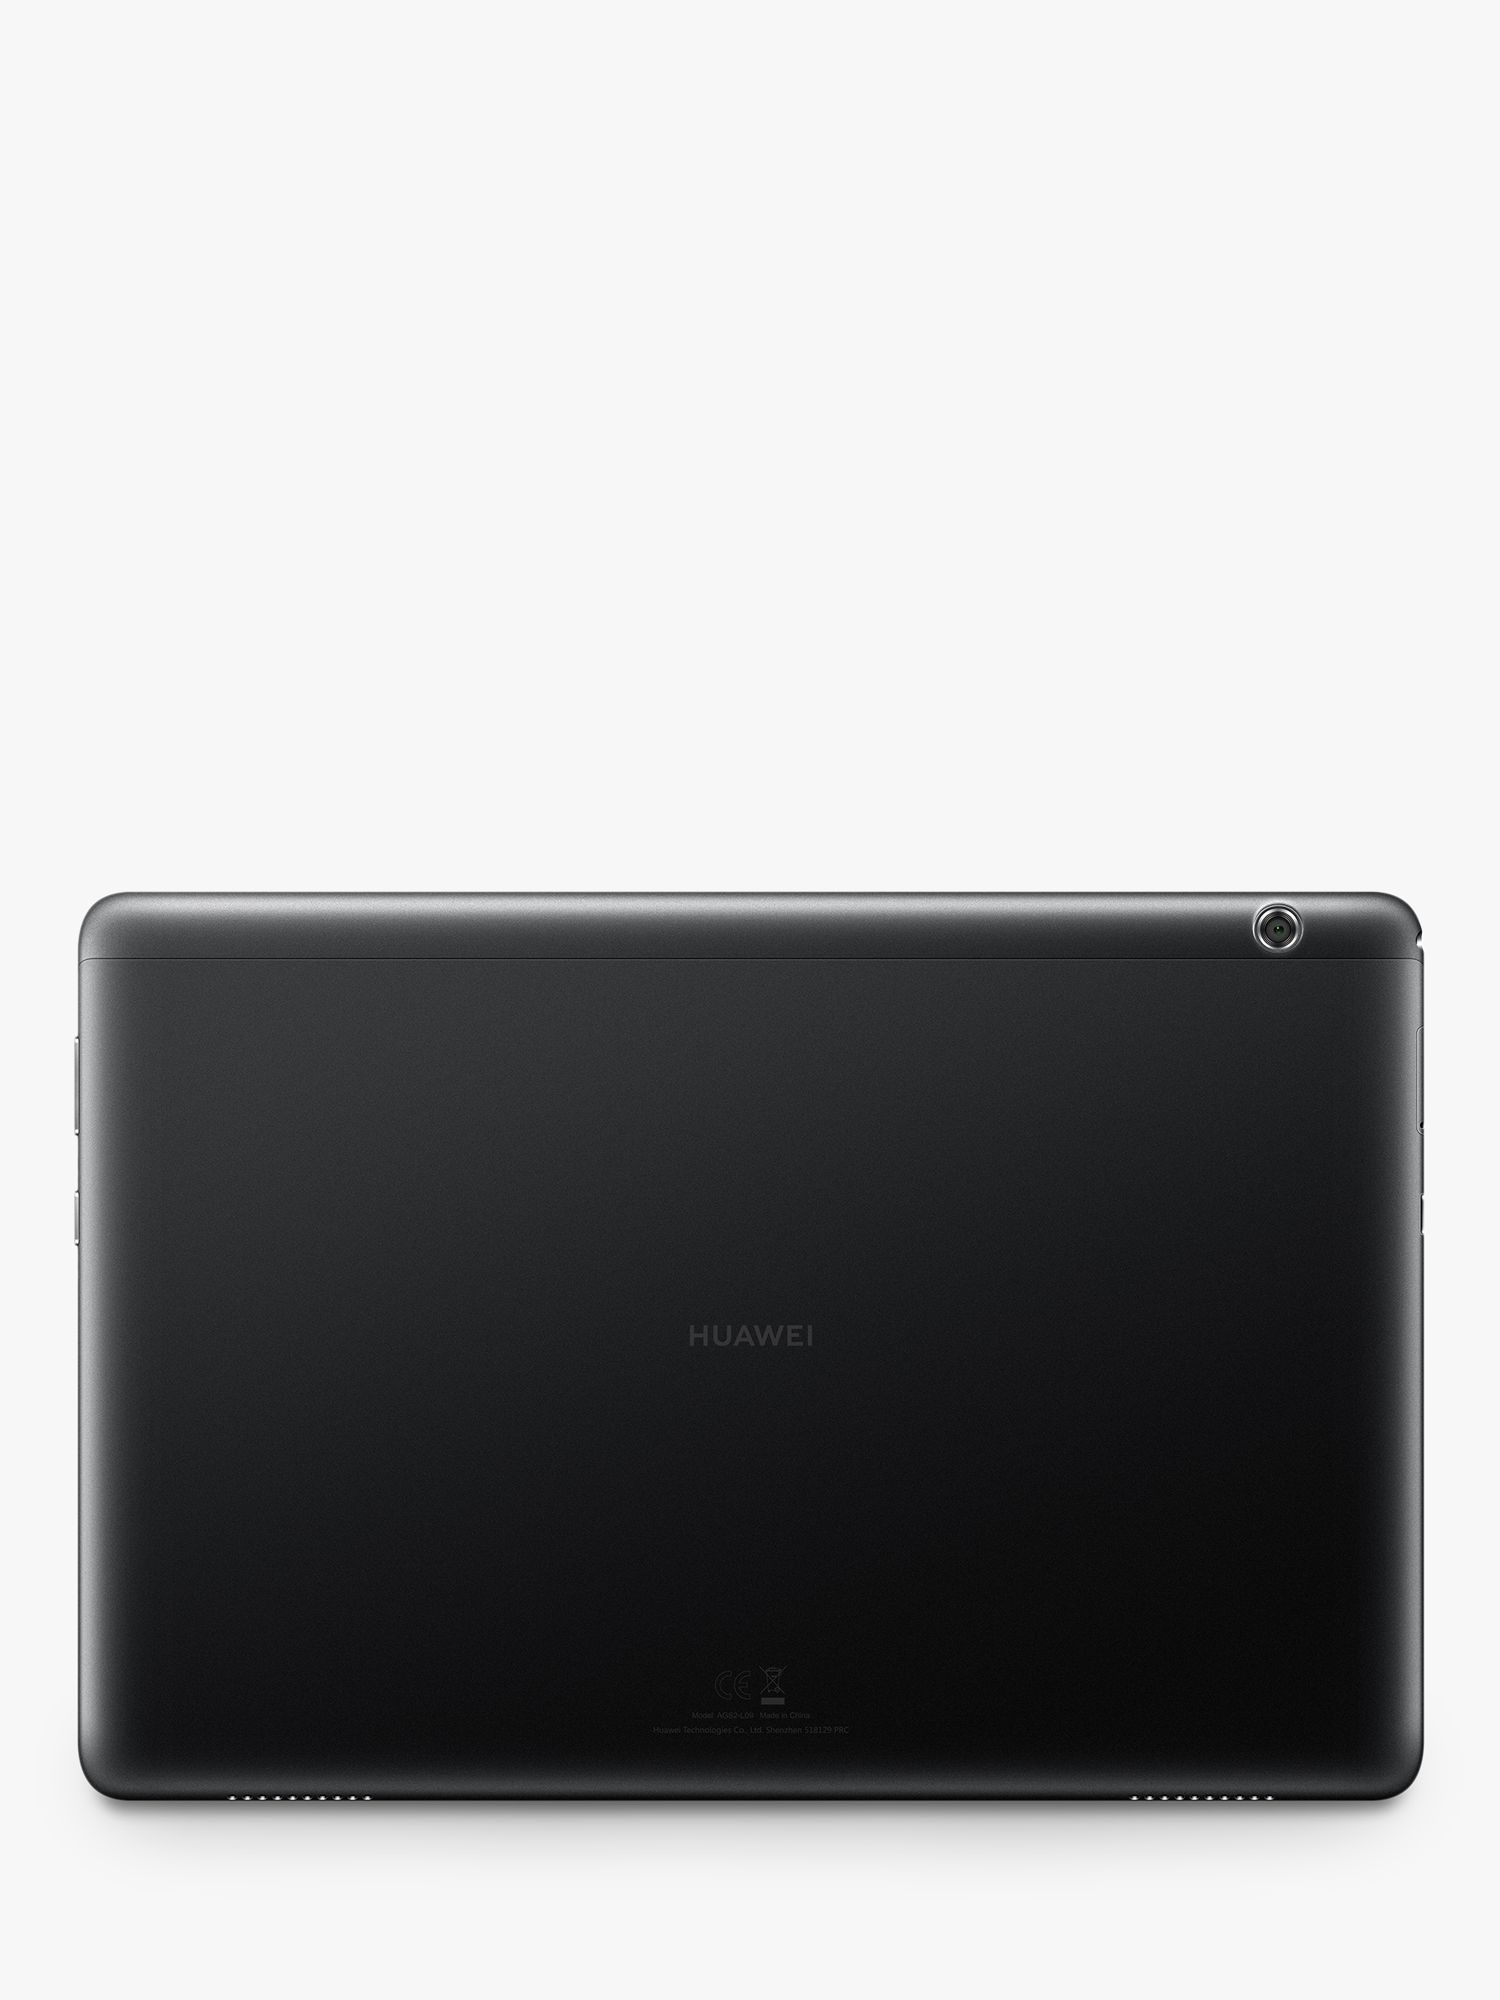 Huawei Mediapad T5 10 2019 Tablet Android Kirin 659 3gb Ram 64gb Storage 10 1 Black 4gb Ram